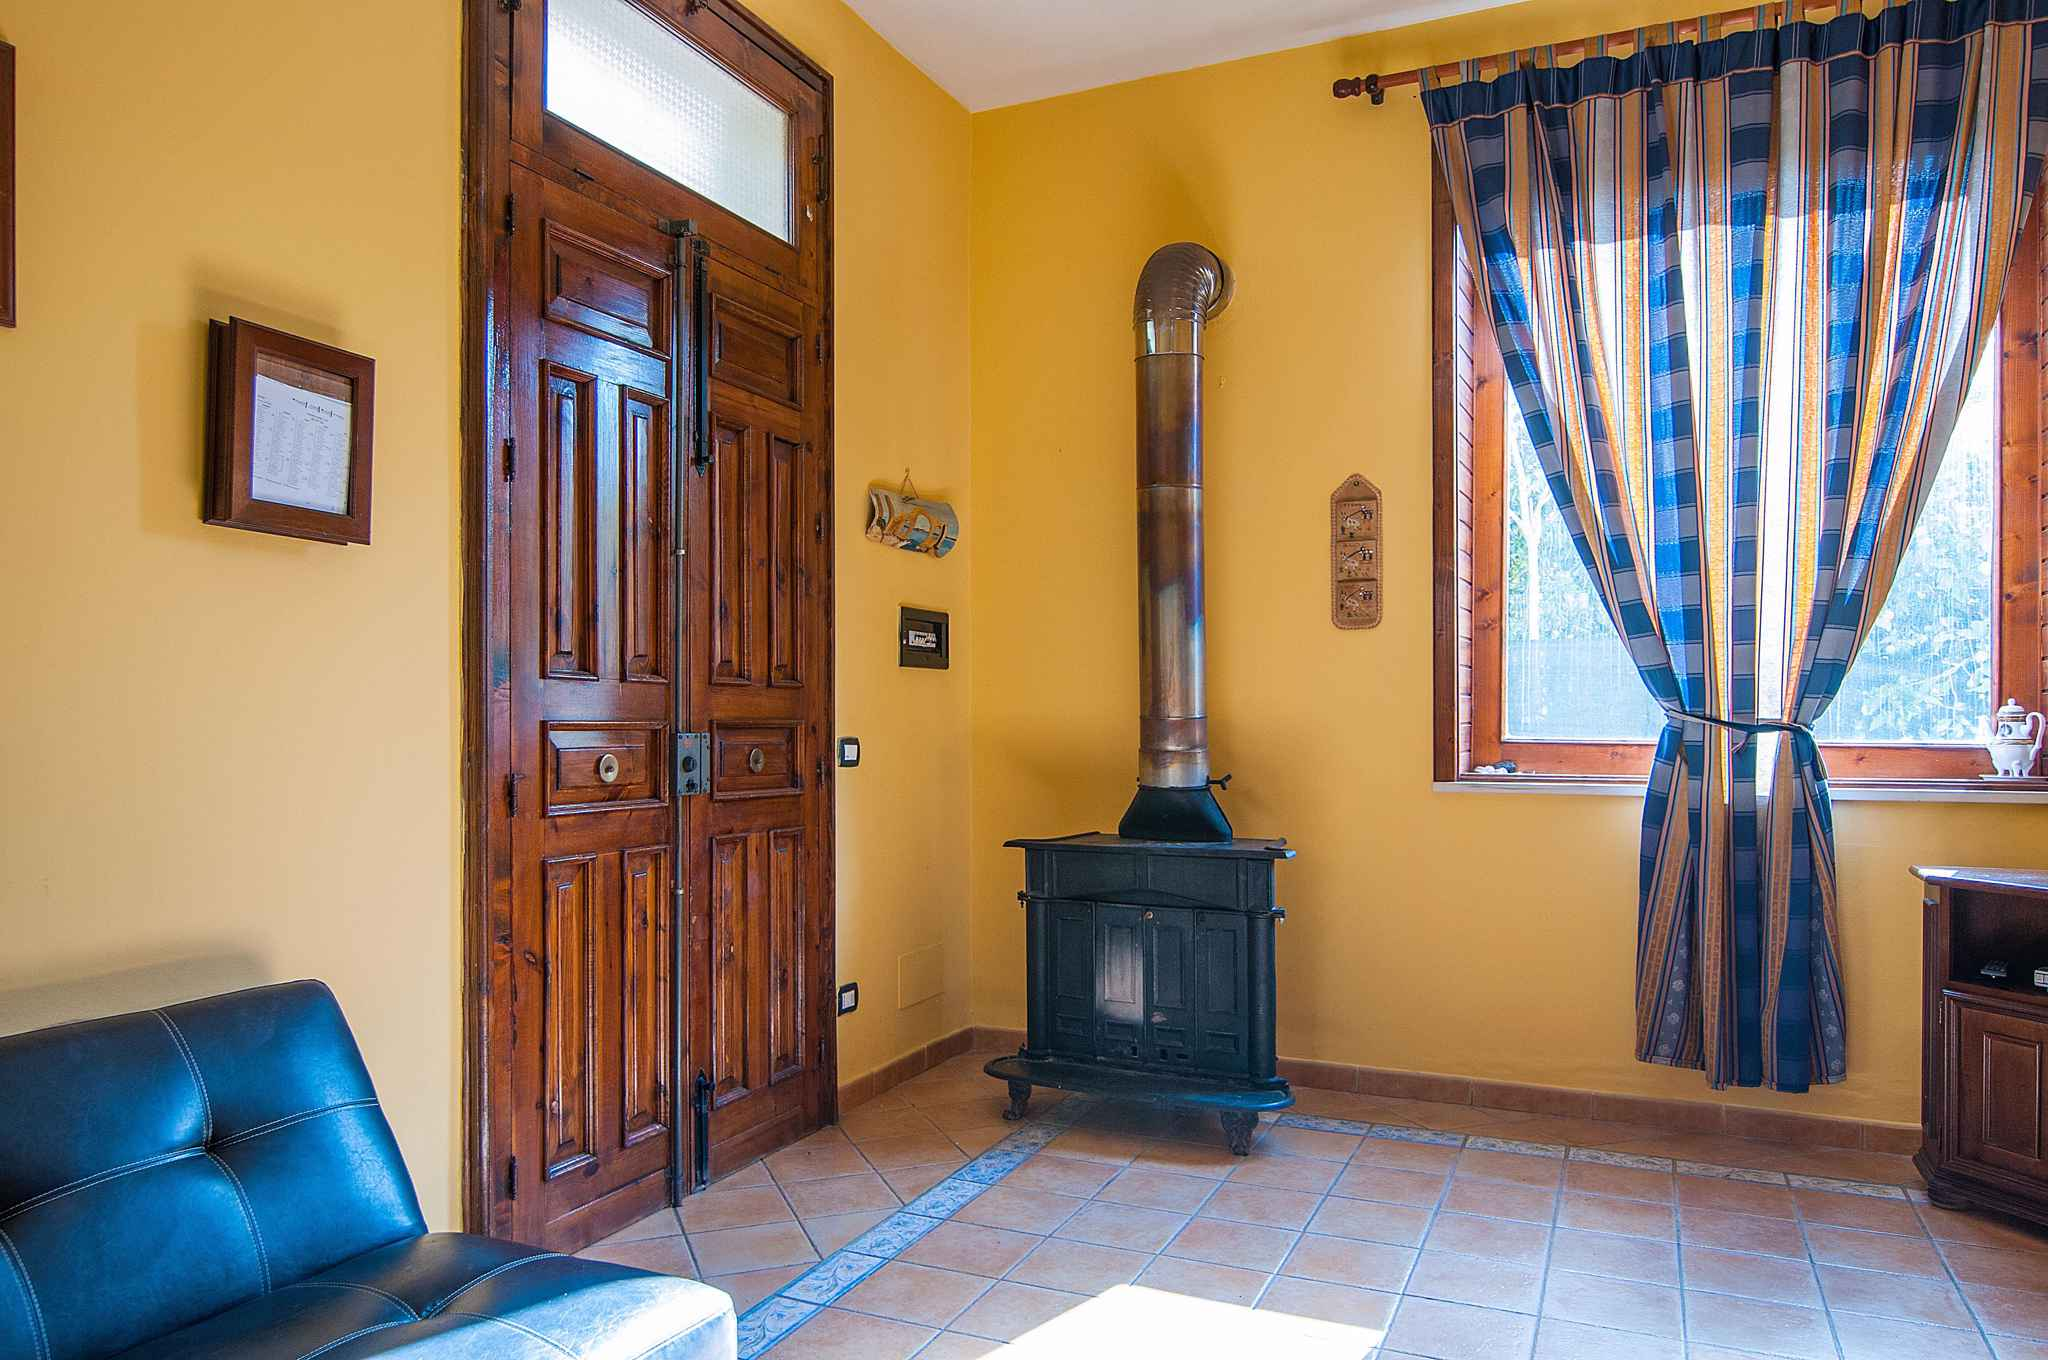 Maison de vacances mit Blick auf Zitronengarten (317534), Lido di Noto, Siracusa, Sicile, Italie, image 15